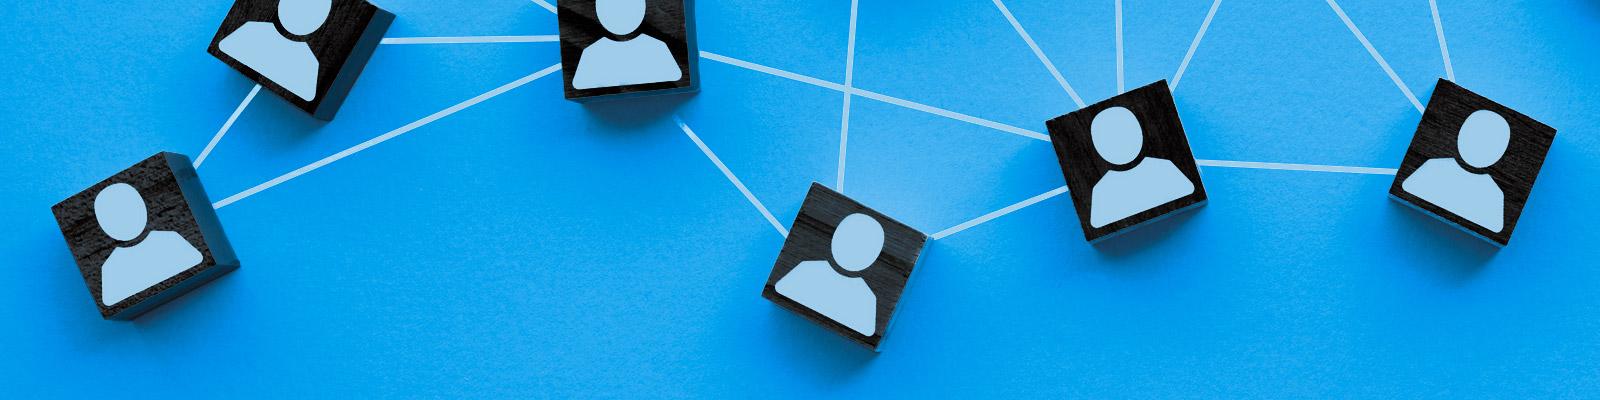 Stratégie & Conseil - Communication interne